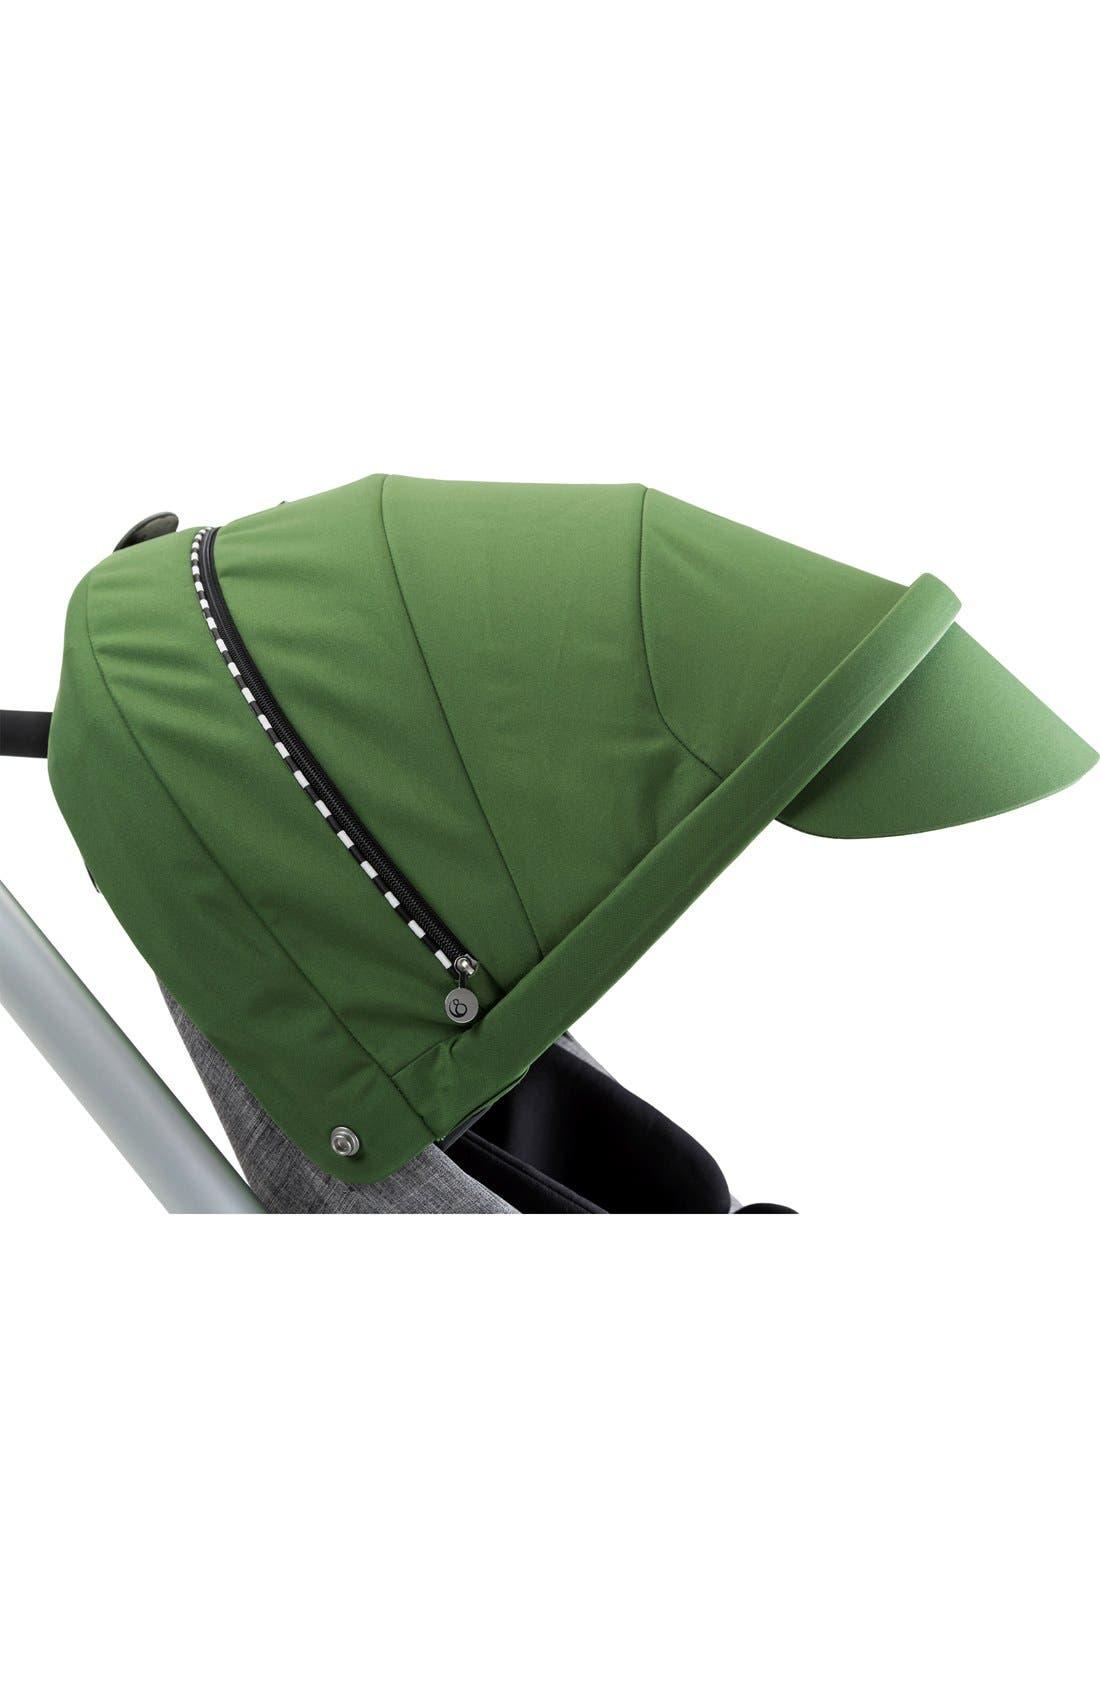 Alternate Image 2  - Stokke Scoot™ V2 Style Kit